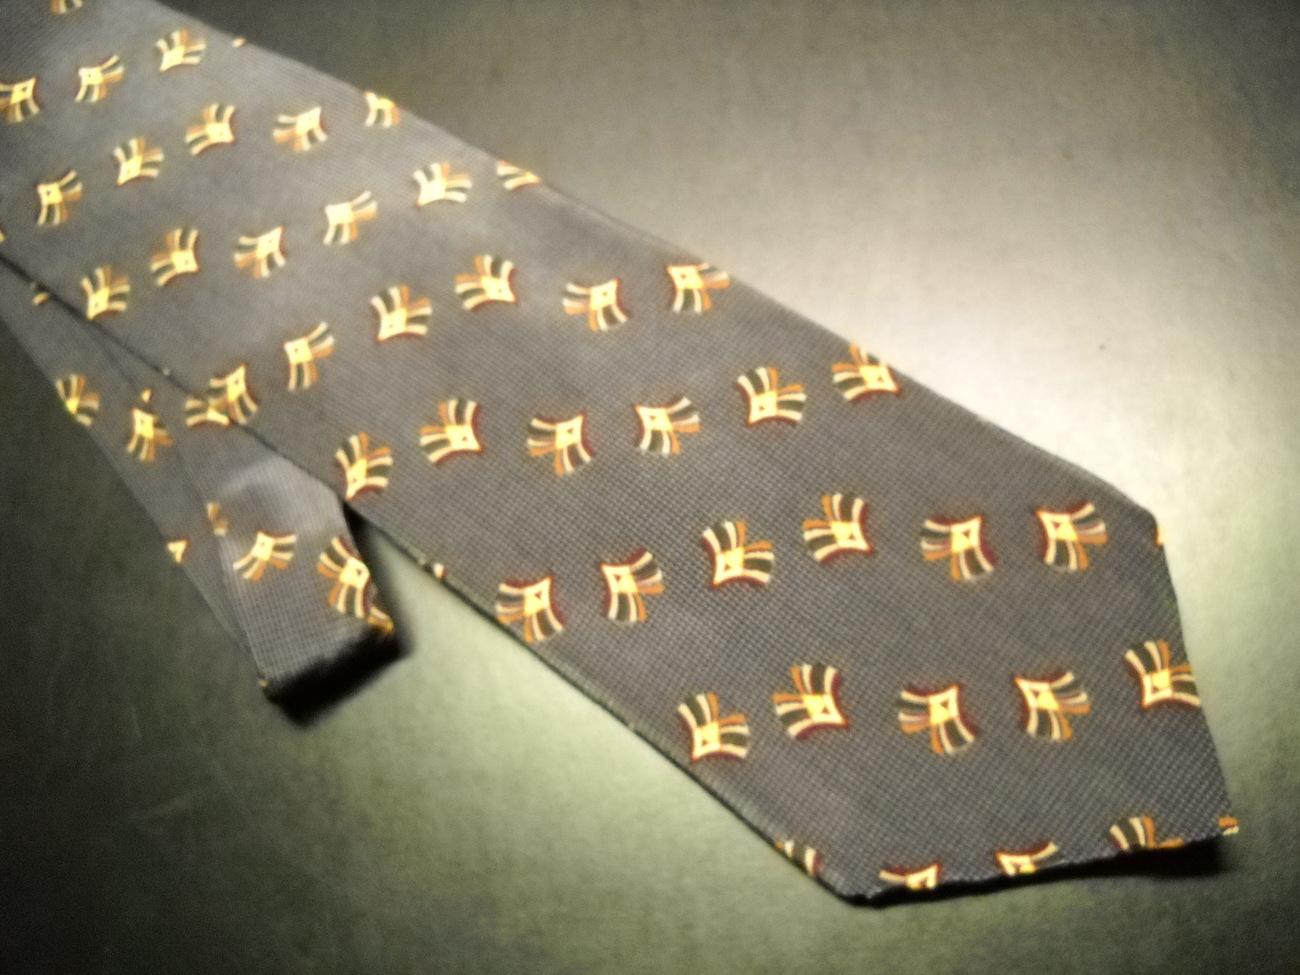 Bill Blass Black Label Neck Tie Browns Unused and Unworn with Retail Paper Tag